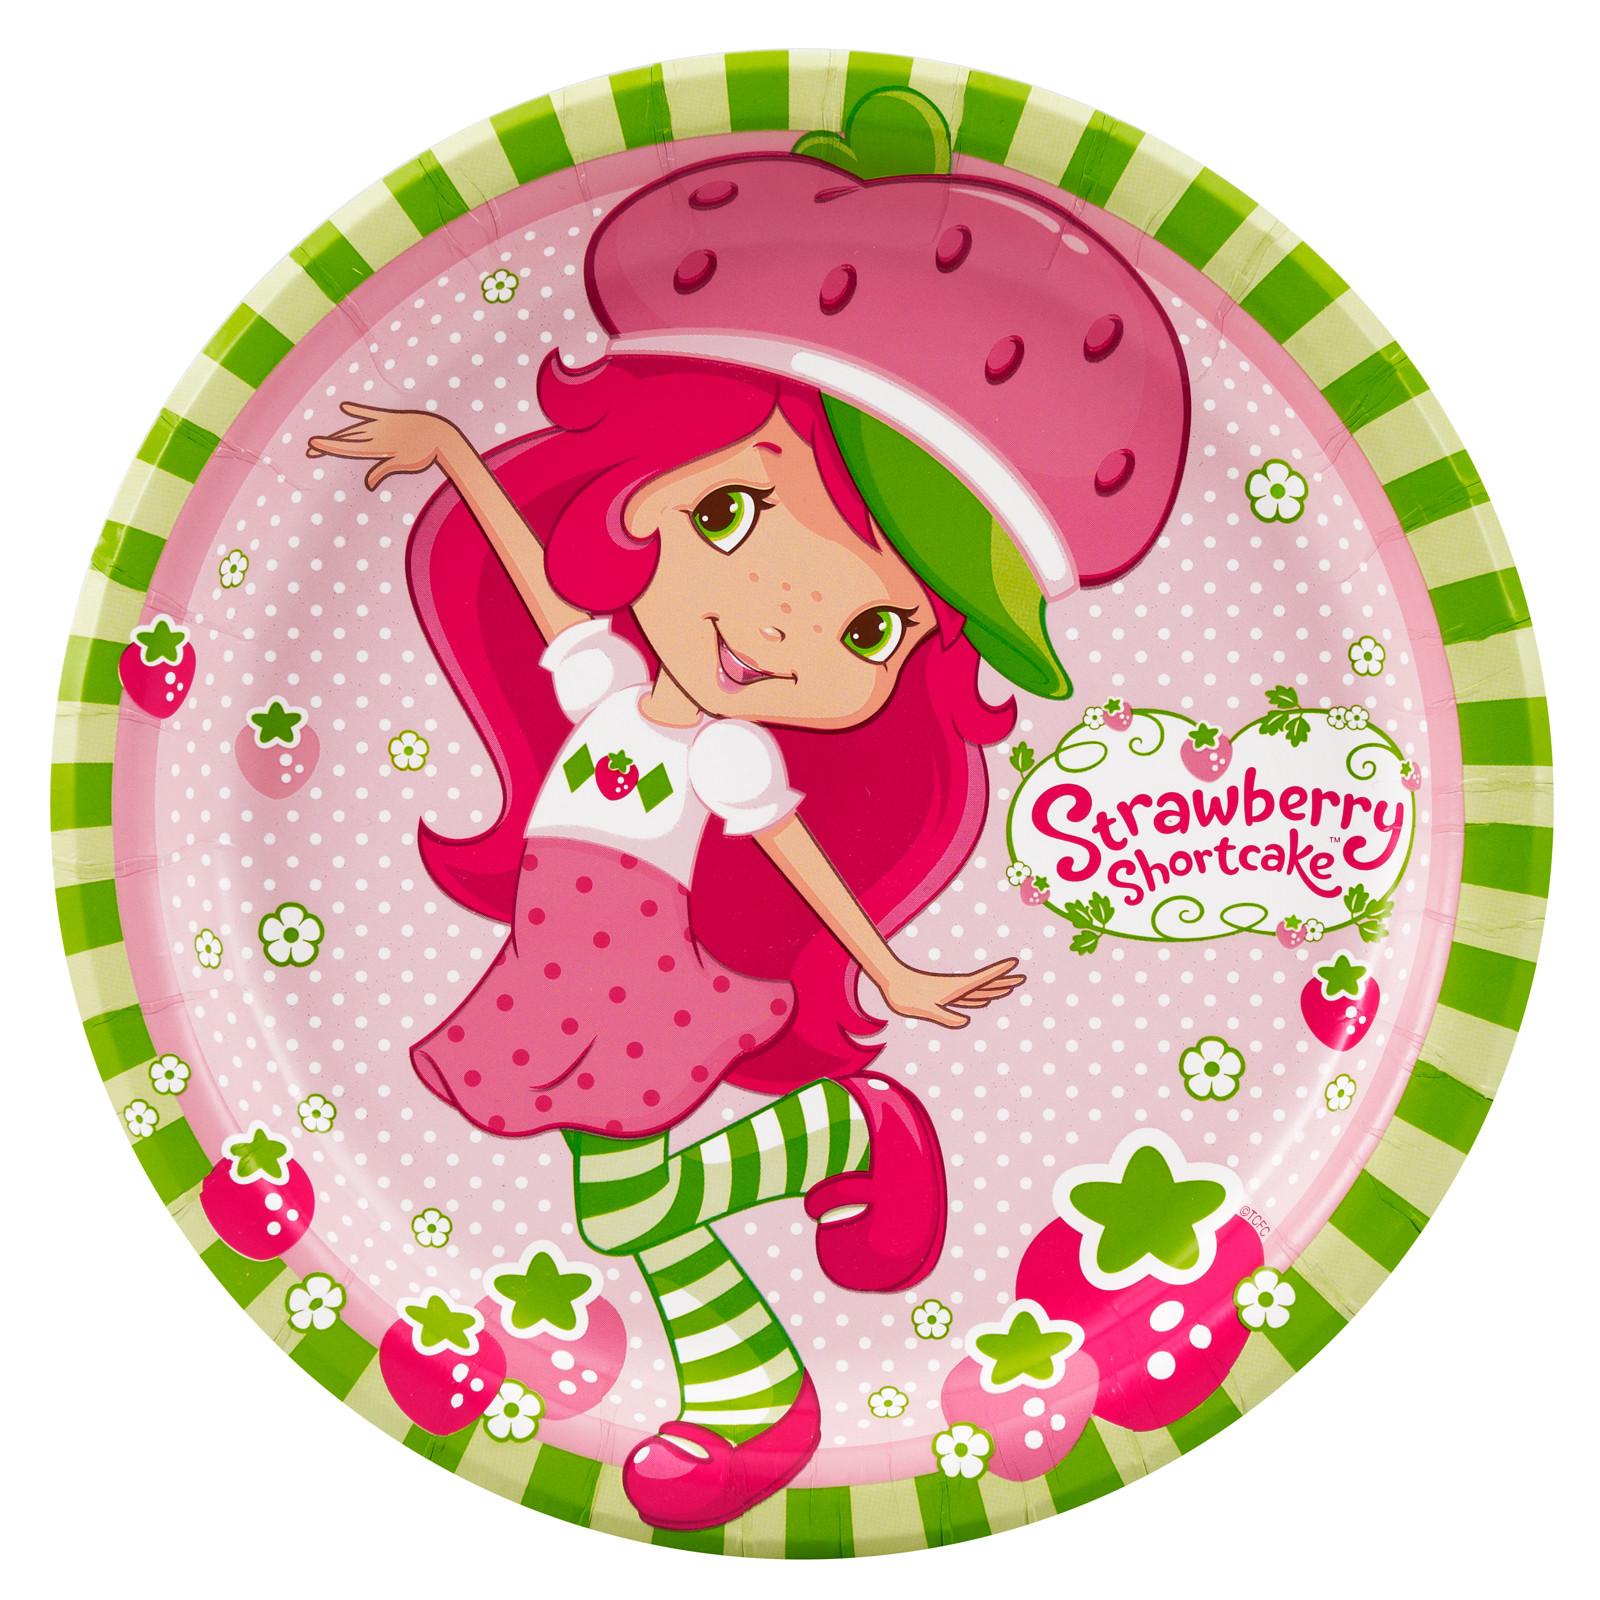 Strawberry Shortcake Videos  Strawberry Shortcake Recipe — Dishmaps